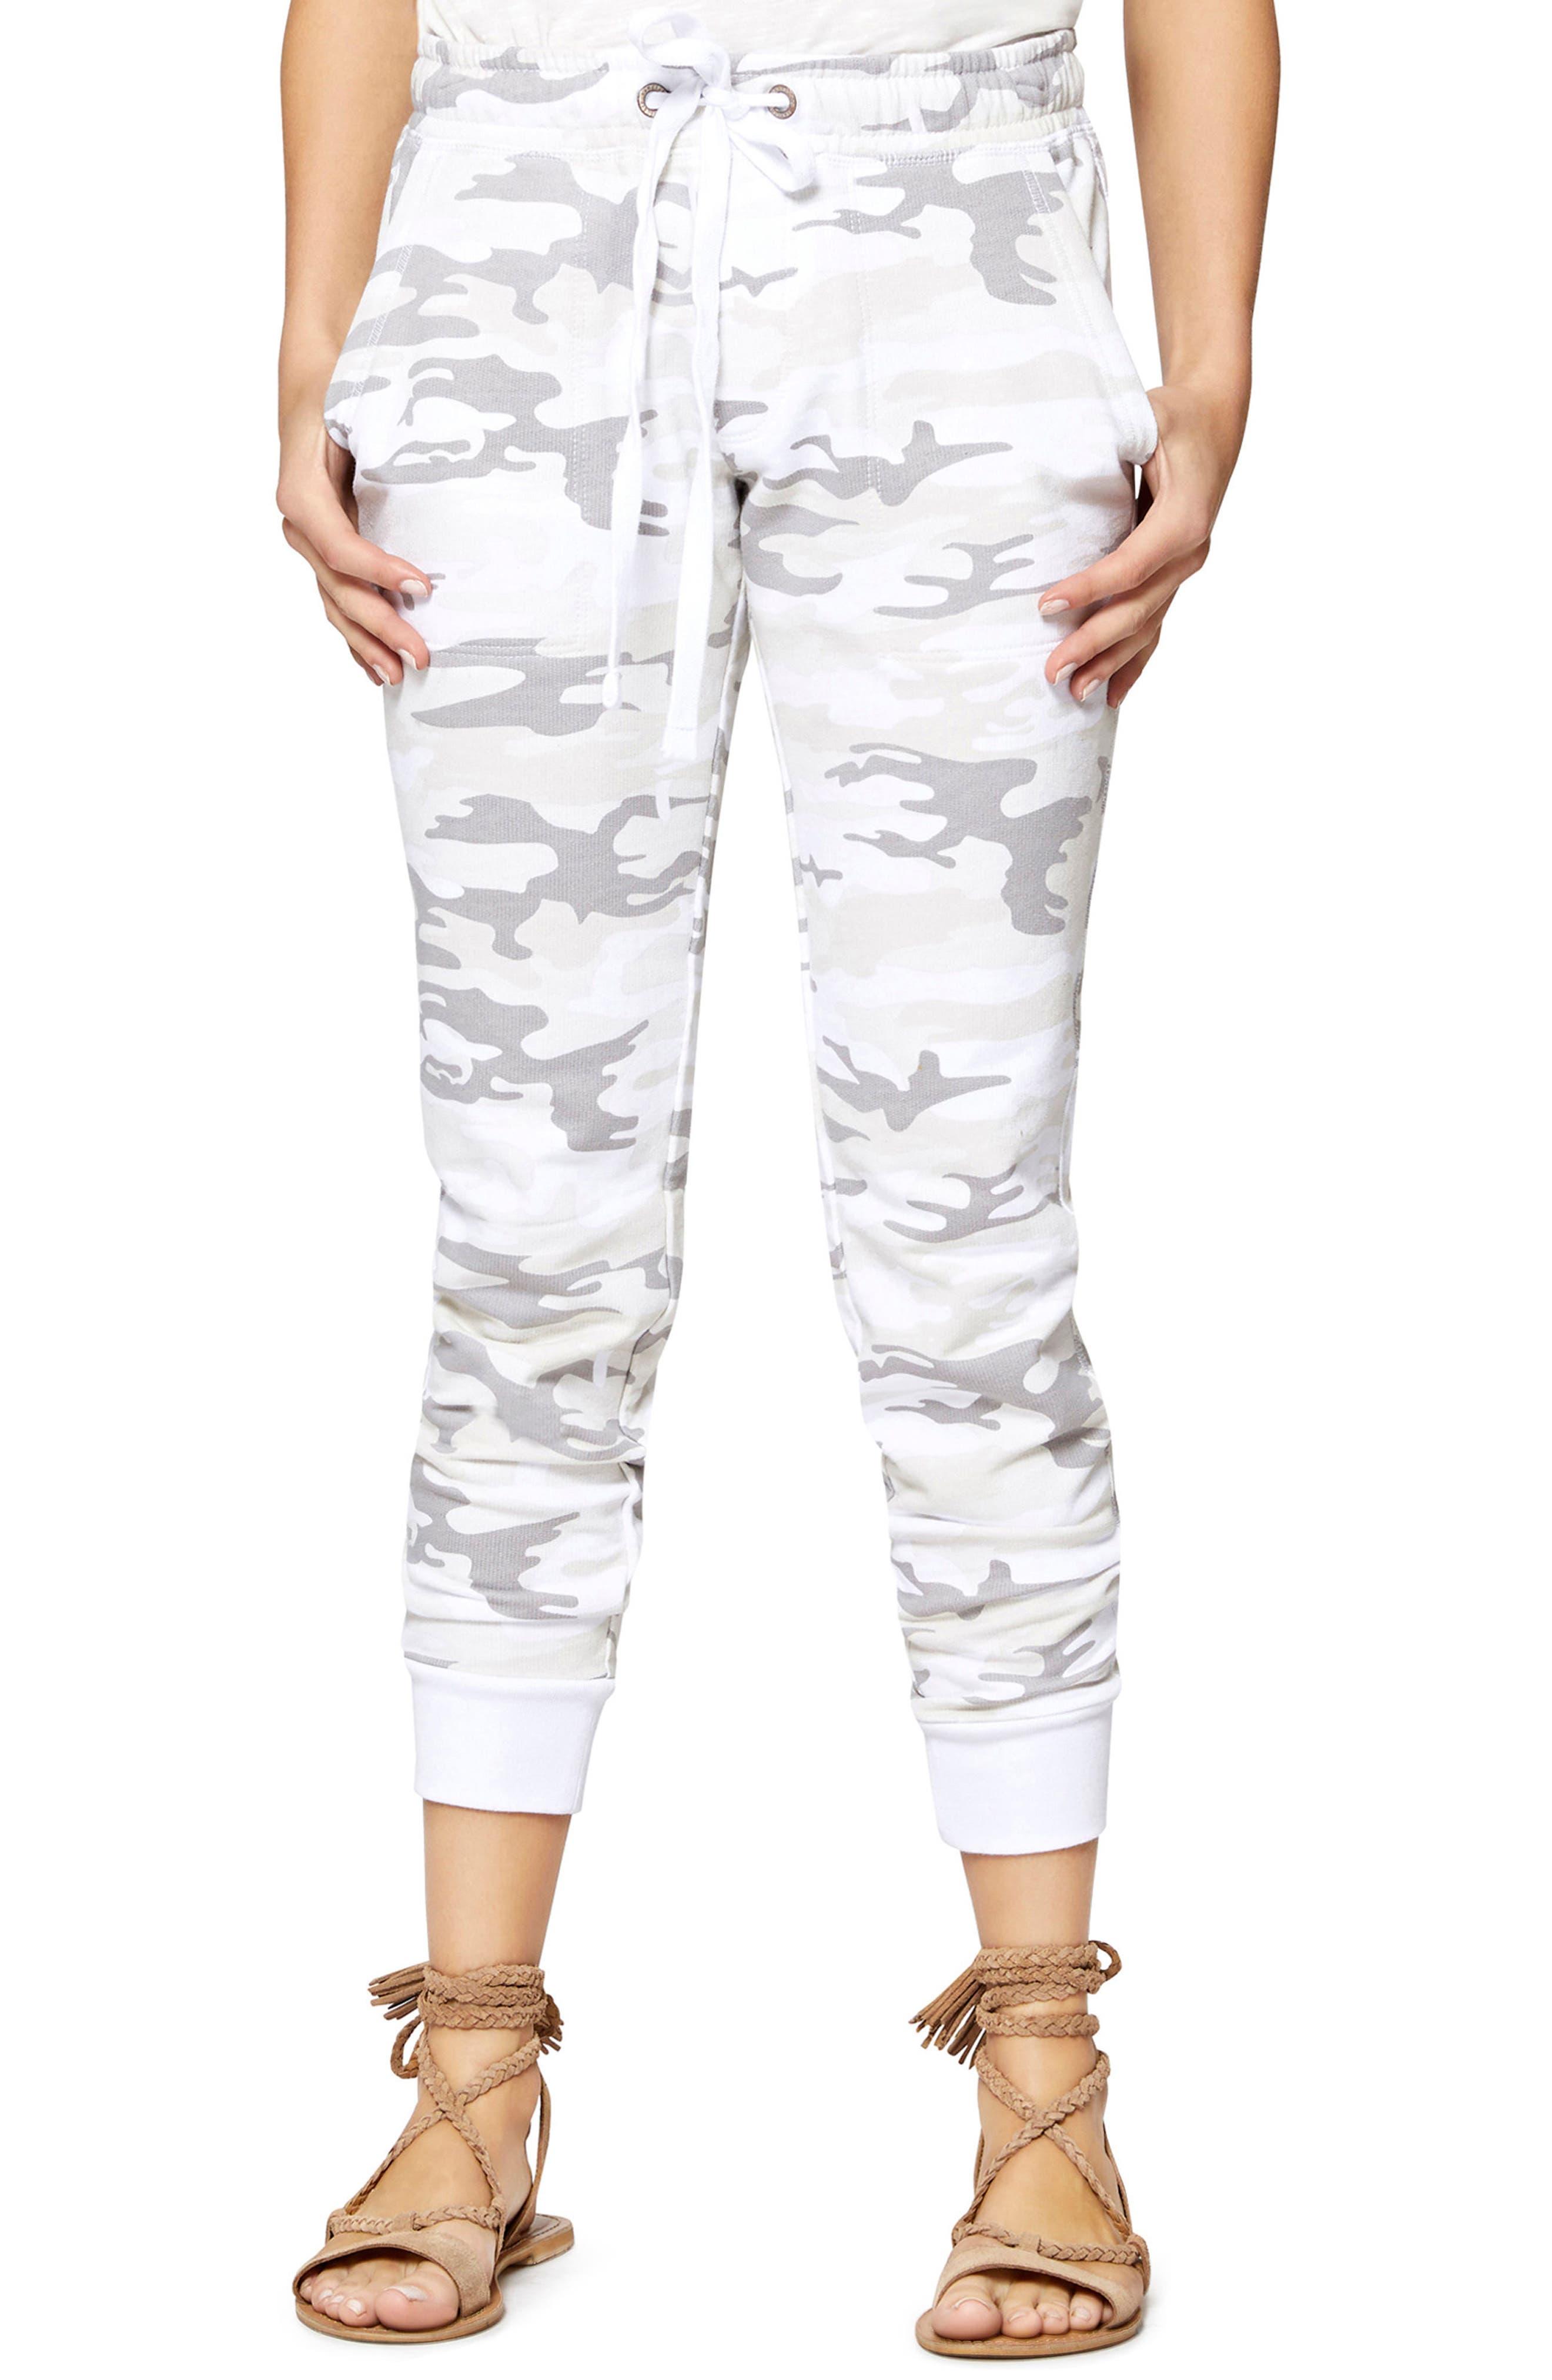 Peace Brigade Jogger Pants,                             Main thumbnail 1, color,                             White Camo